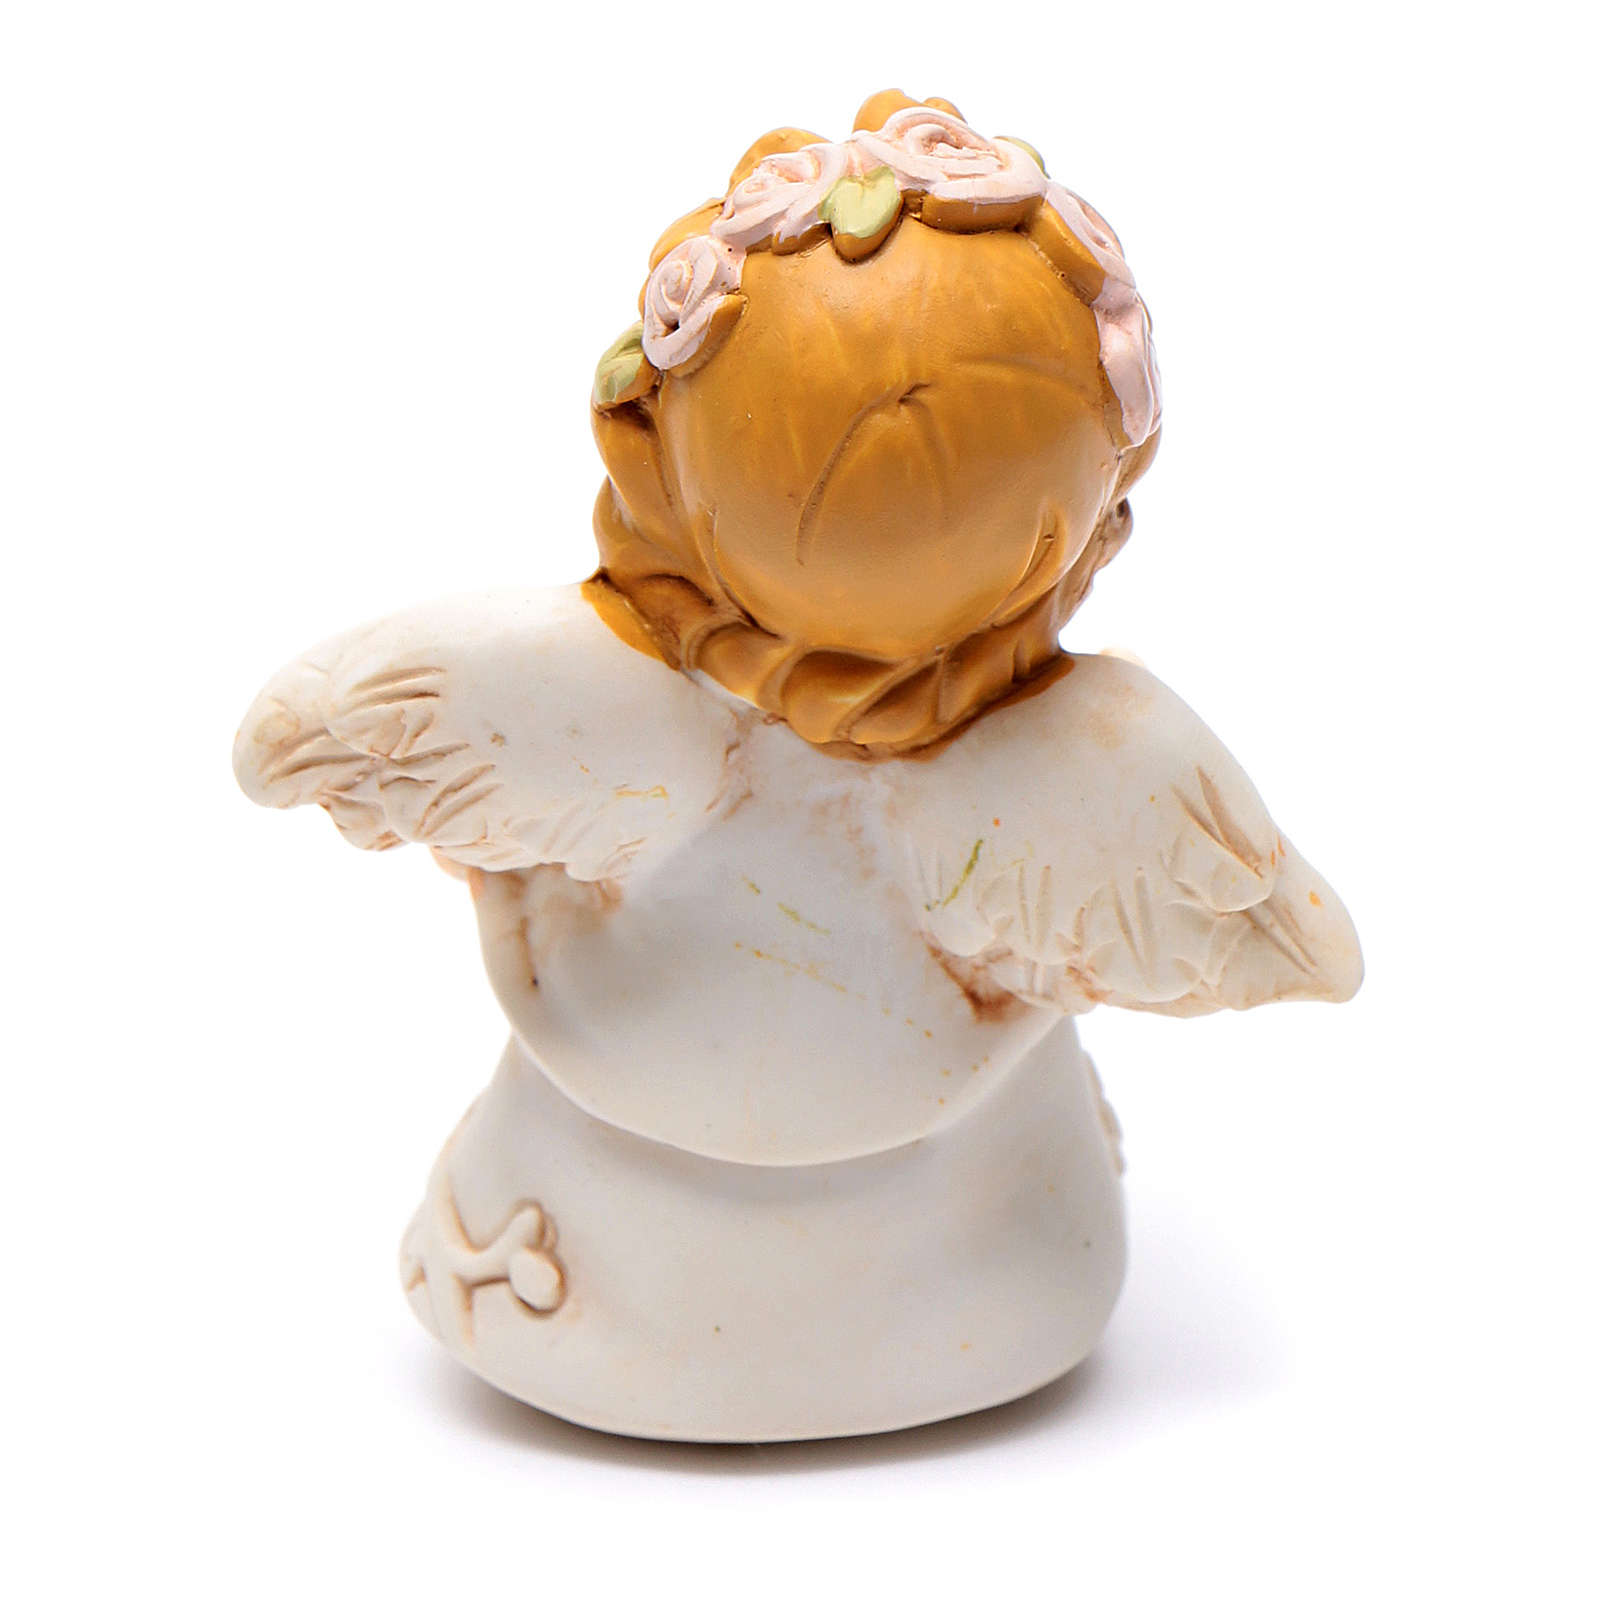 Resin angel figurine with orange flower and glitter 6 cm 3